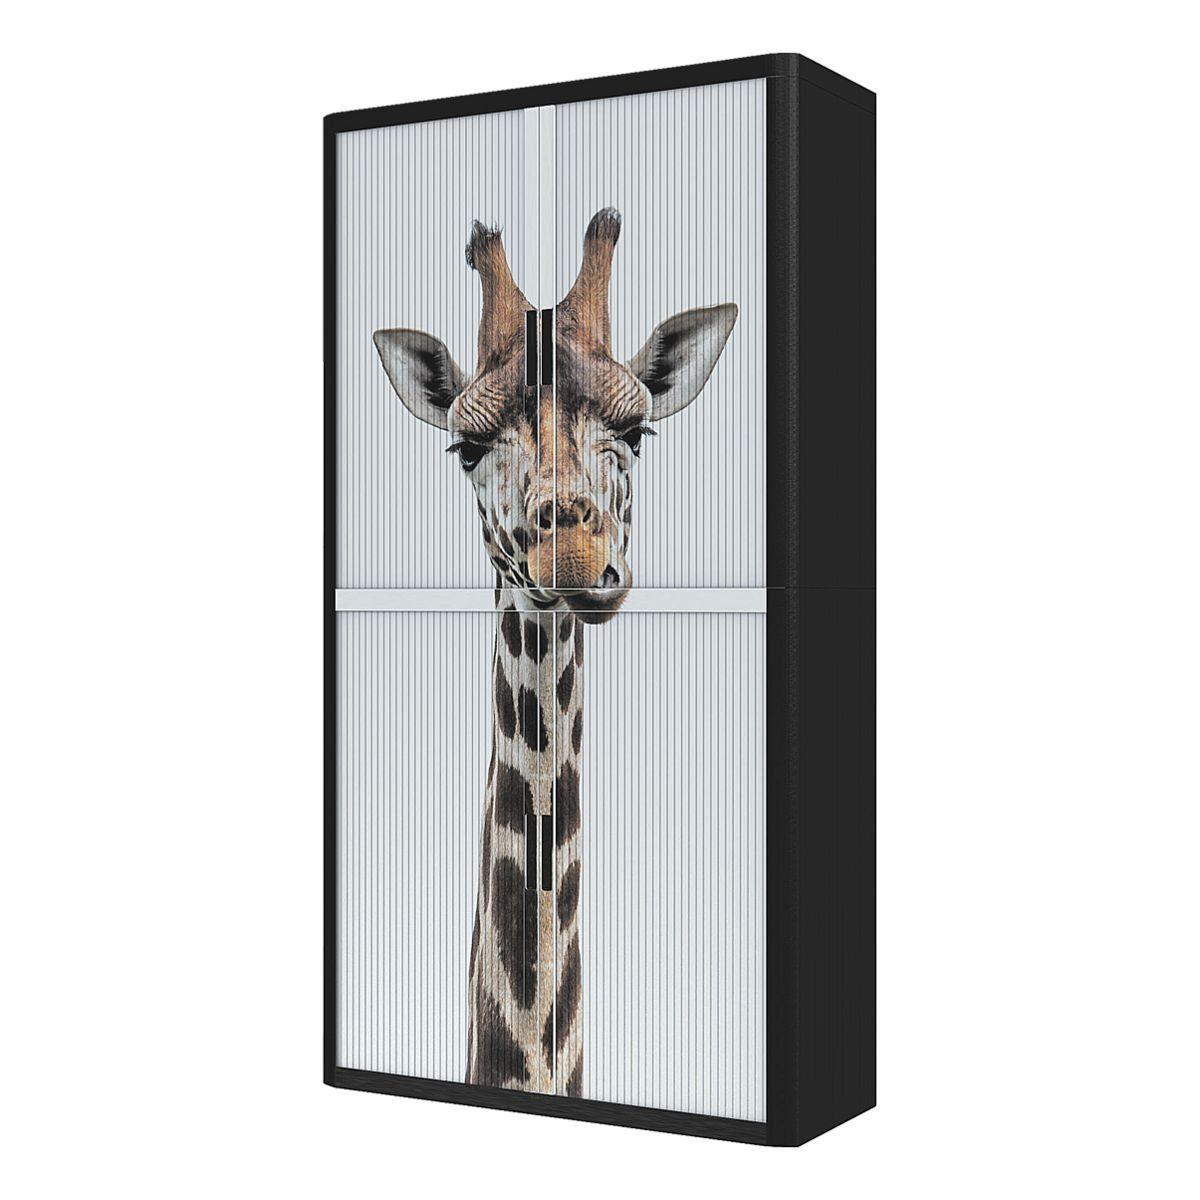 EASYOFFICE Rollladenschrank Motiv Giraffe